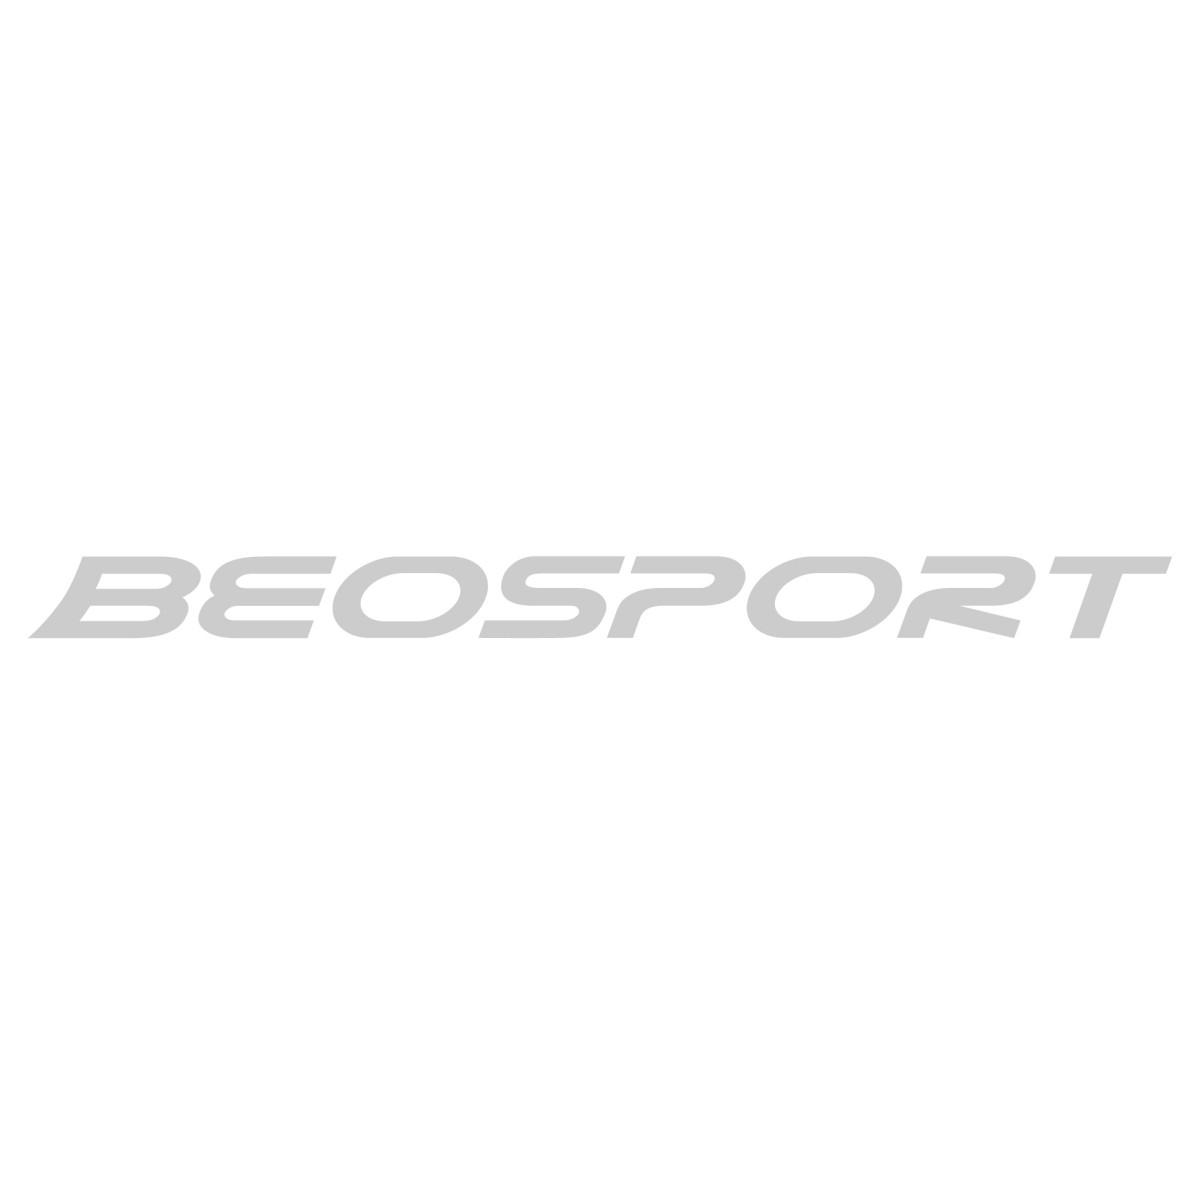 Skechers Intersectors - Protofuel patike